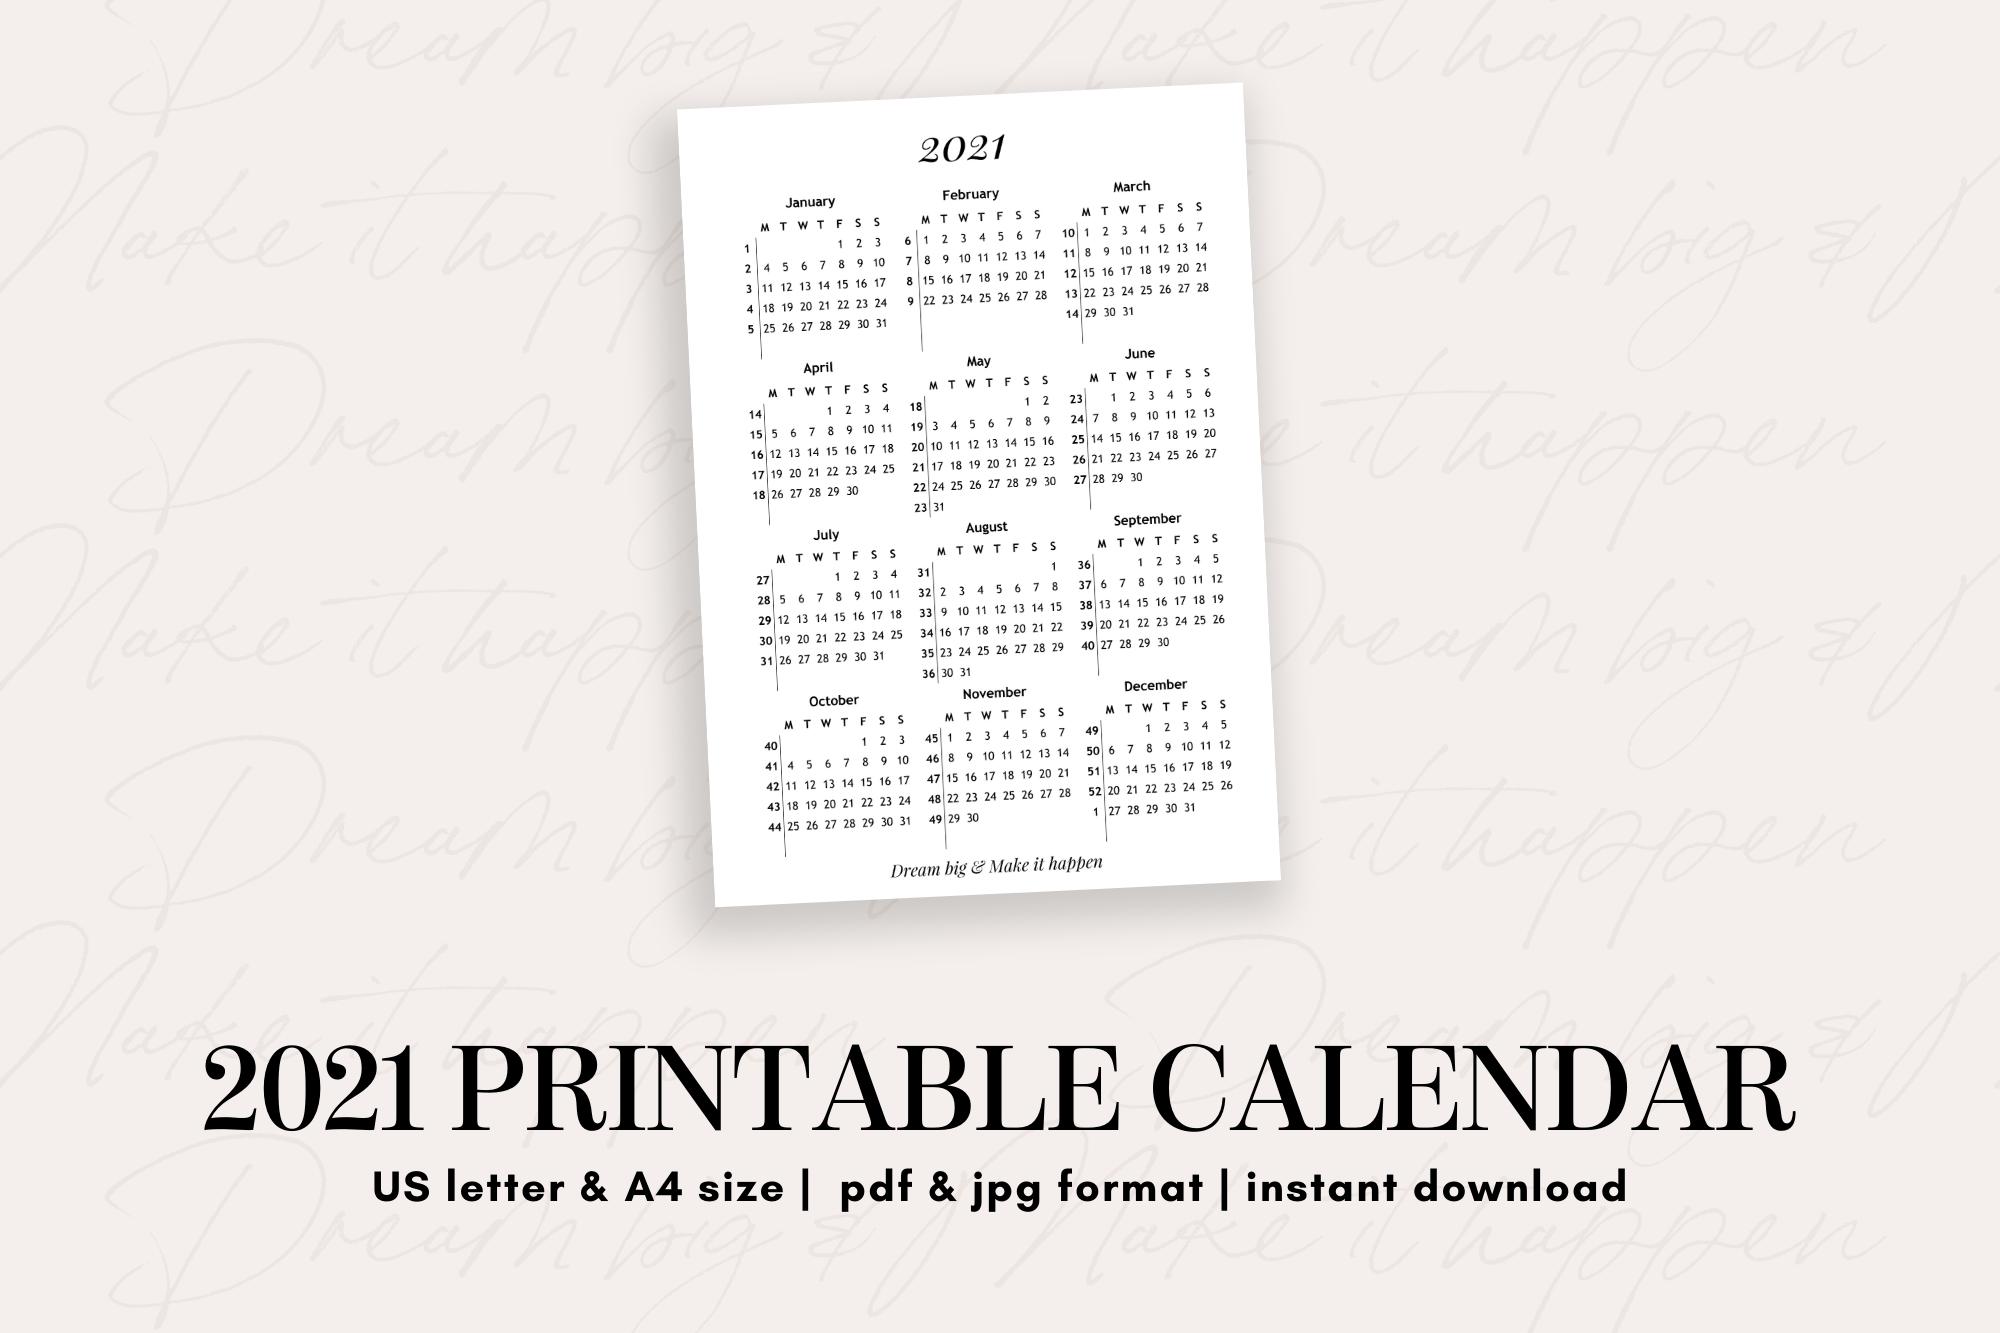 2021 Printable Calendar -  teacher resources, school activities, financial planning, budgeting, art education, personal development, note taking, paper crafts